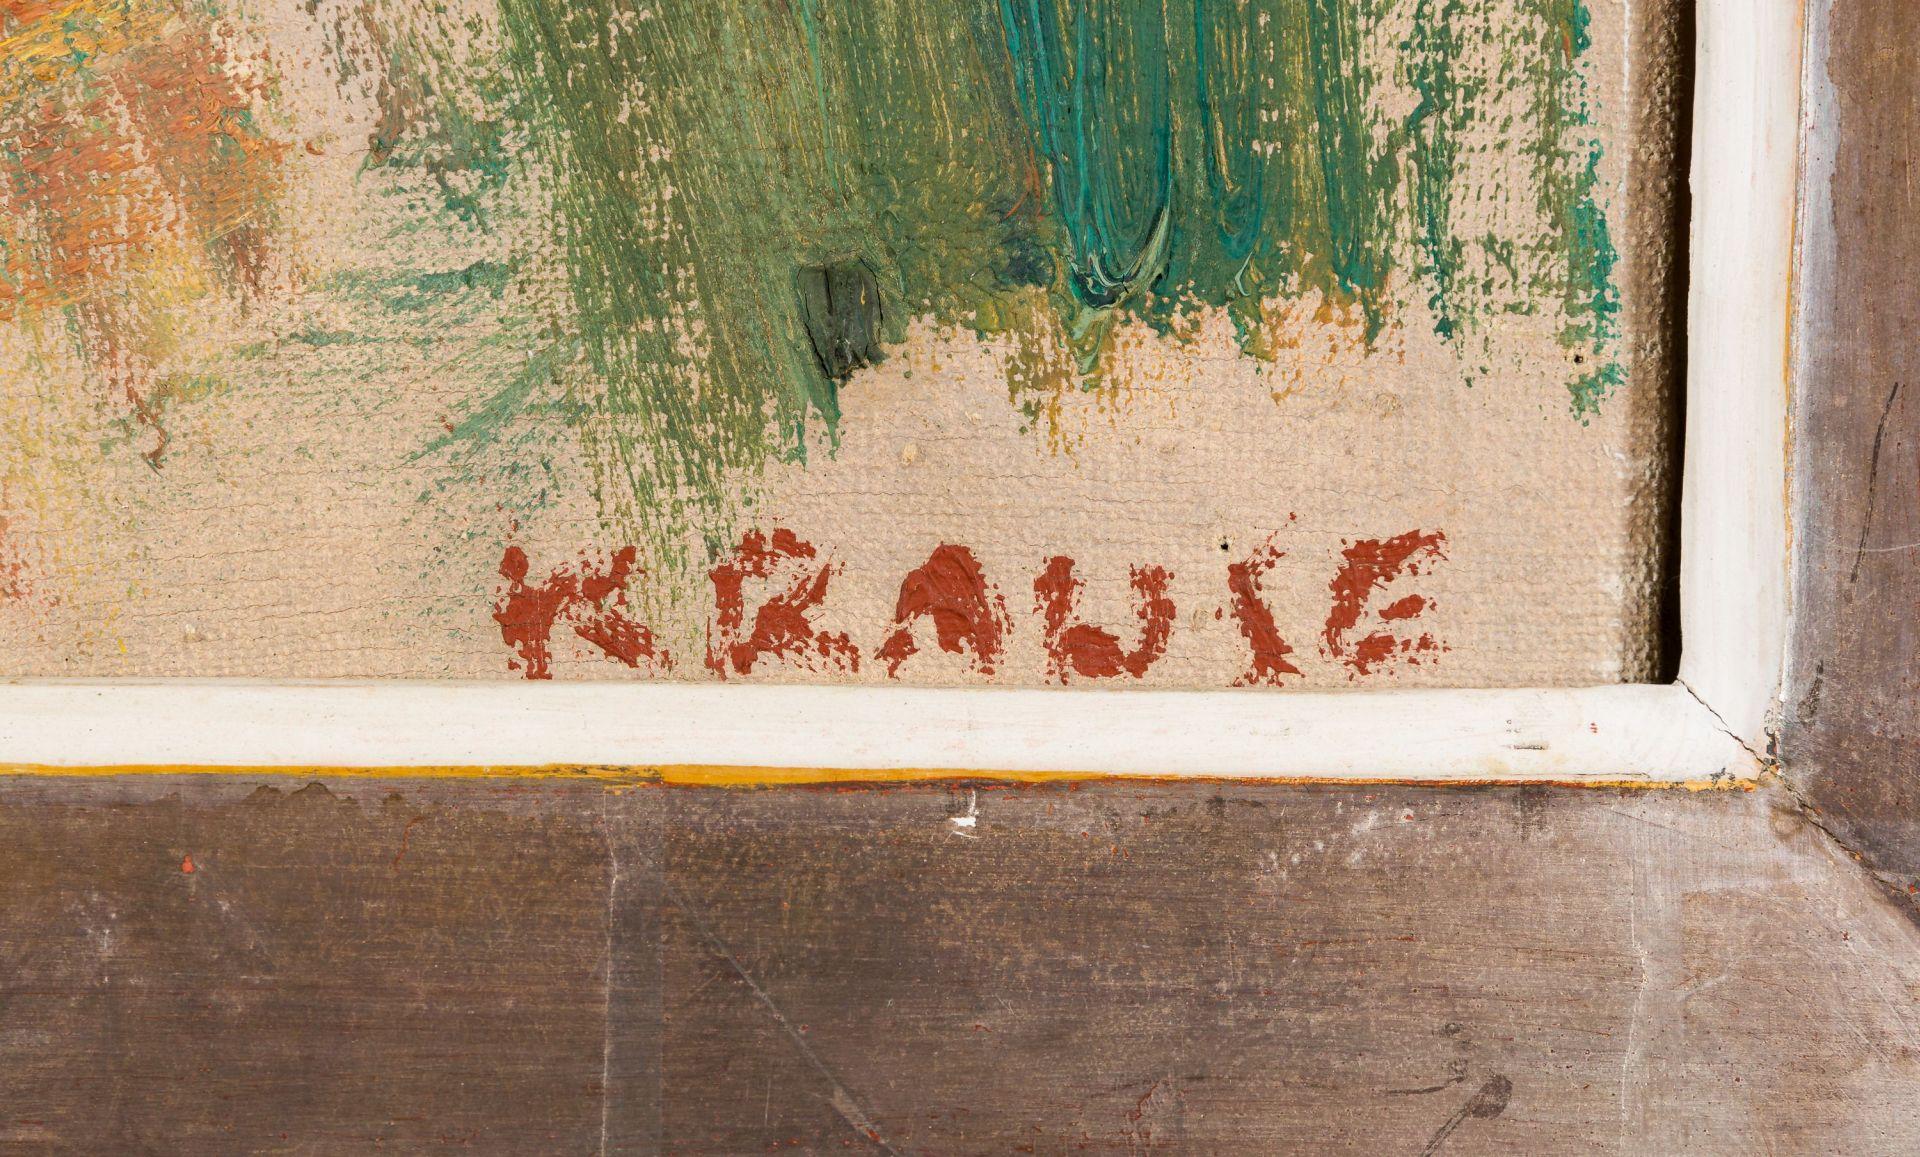 Krause Heinrich-Quarry